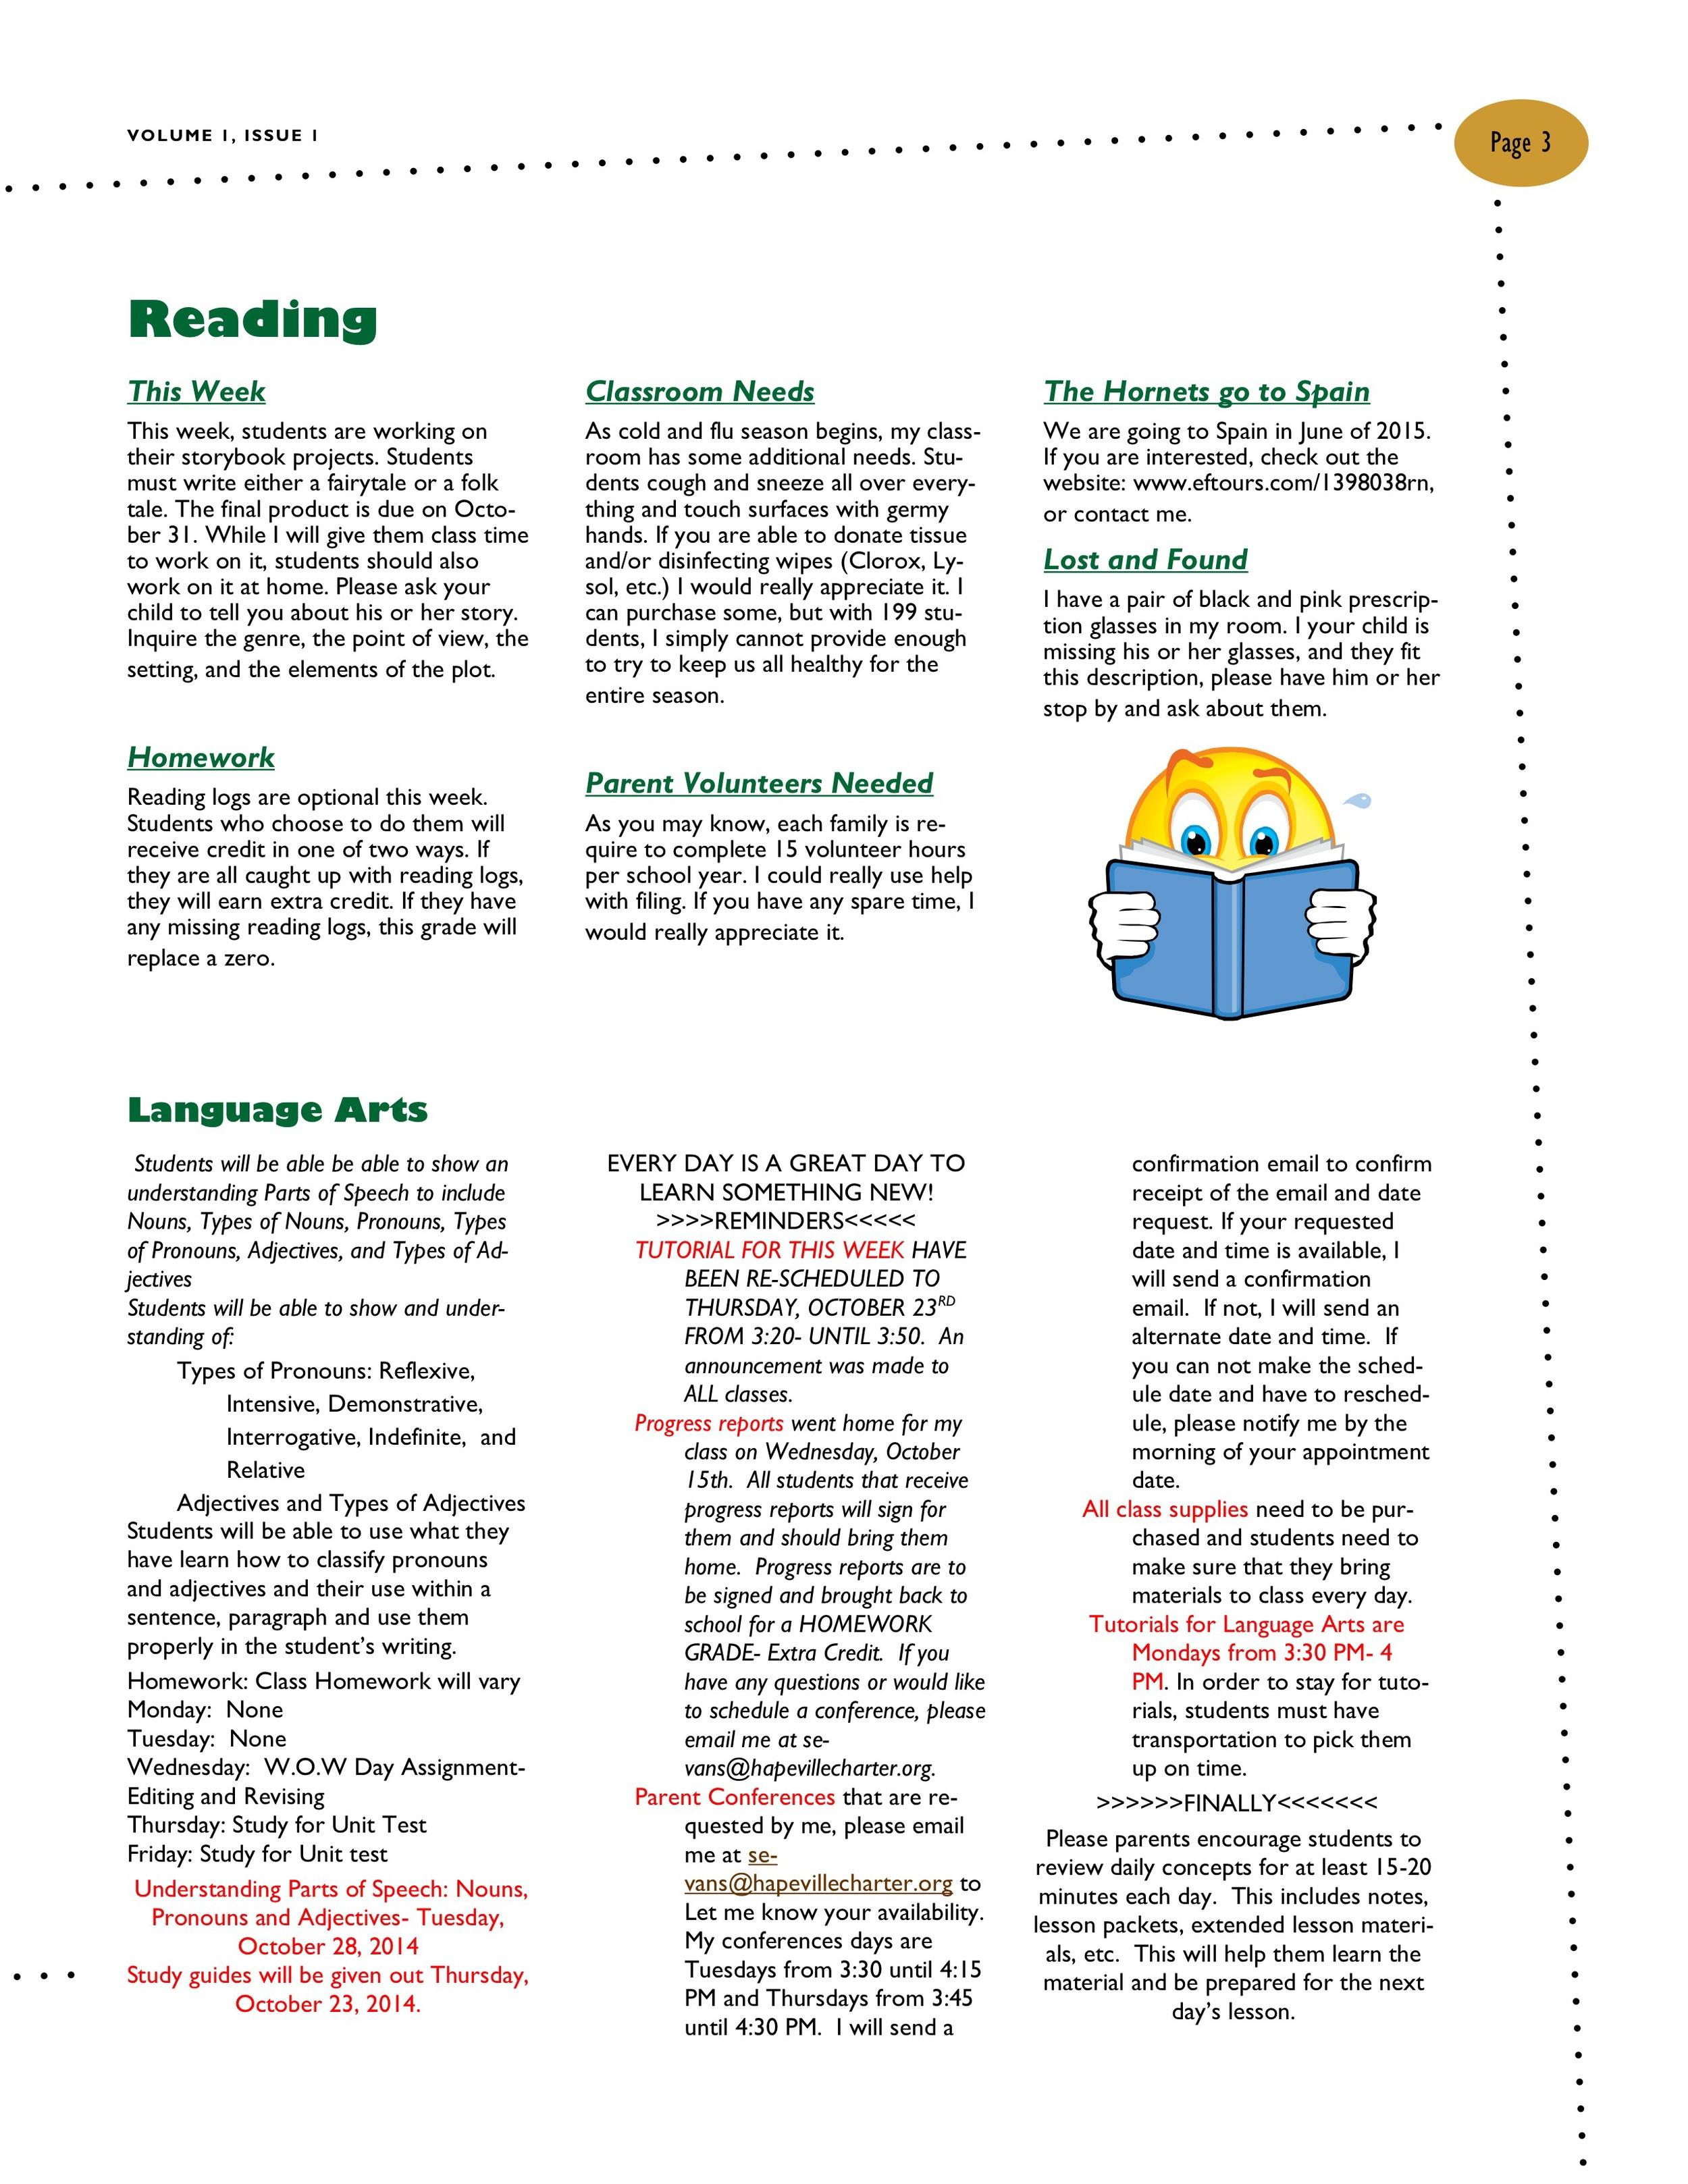 Newsletter Image6th grade 10-20 3.jpeg